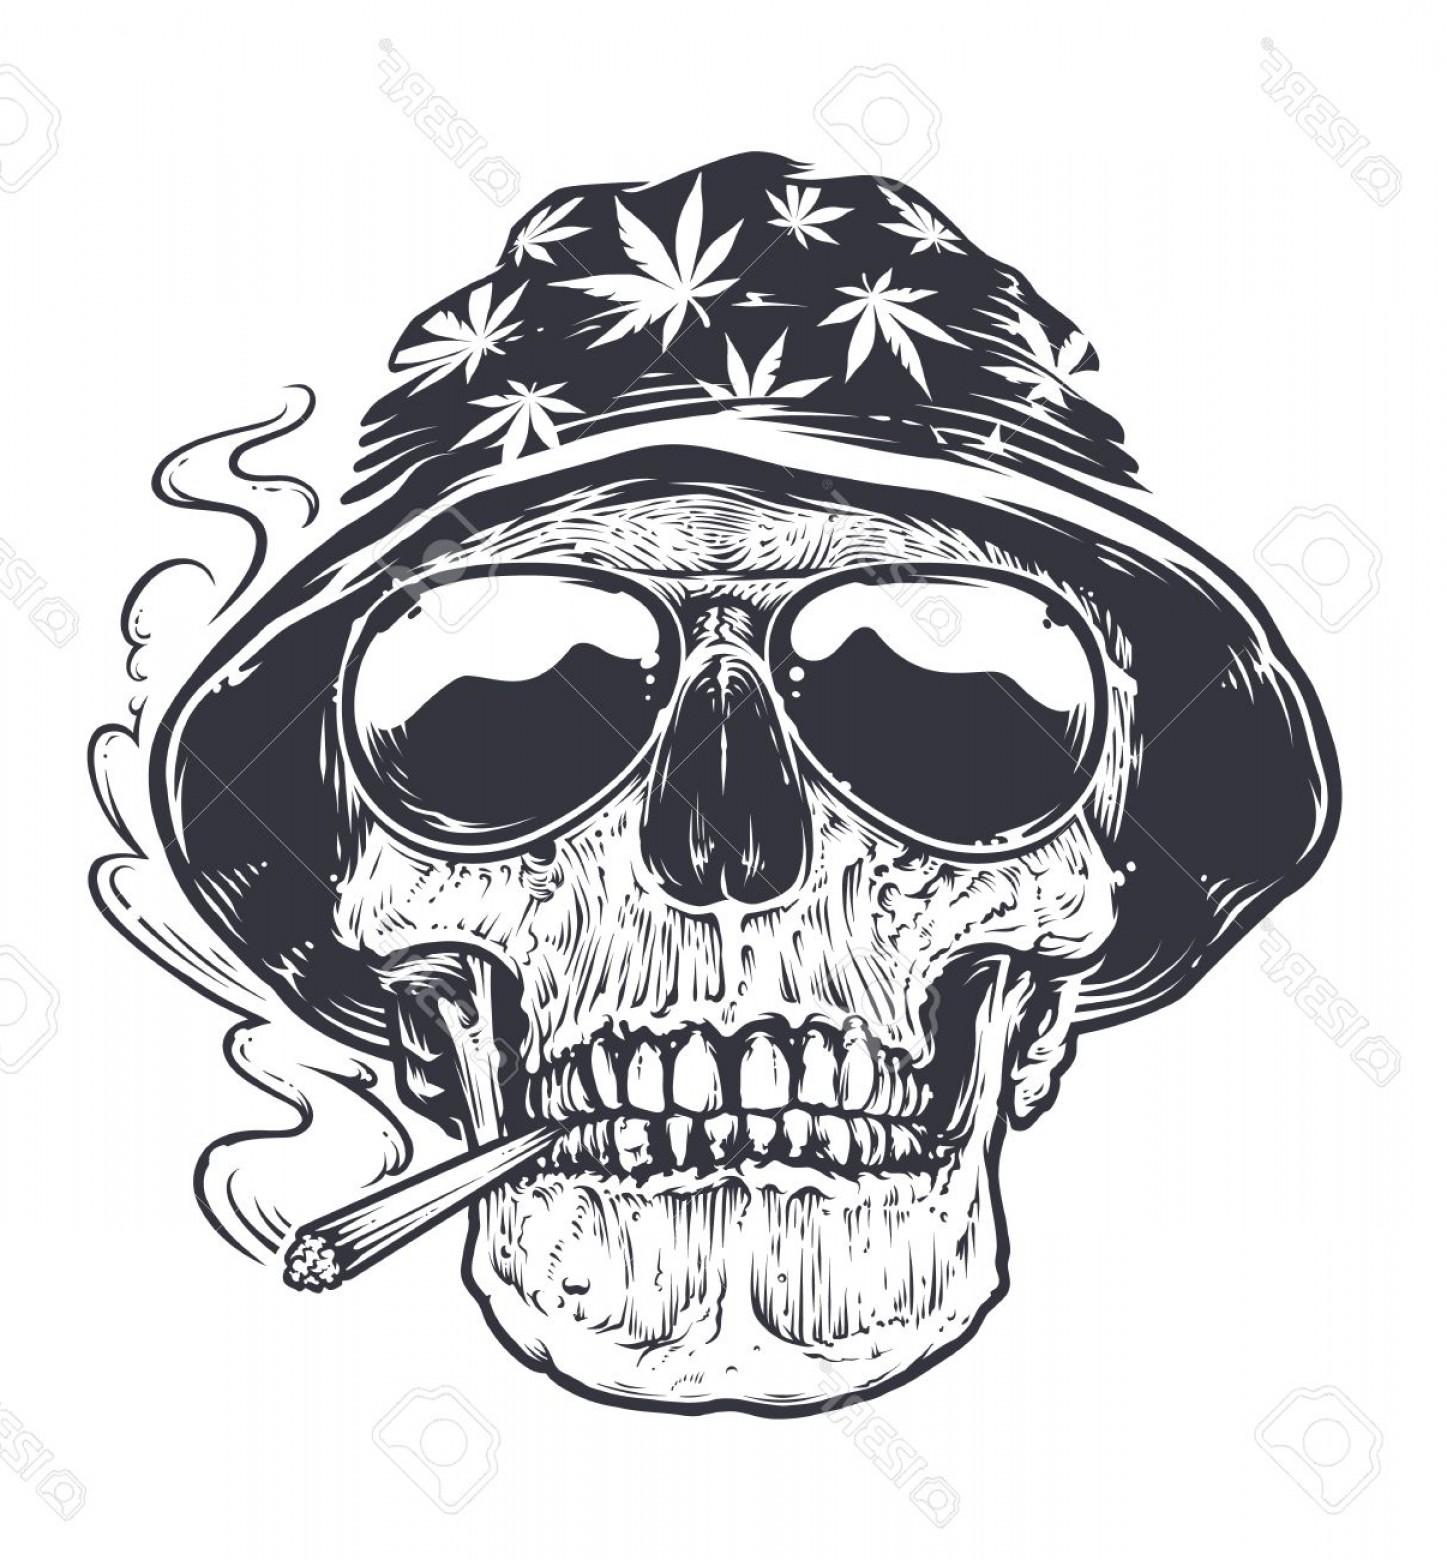 1447x1560 Photostock Vector Rastaman Skull Vector Art Skull In Hat With